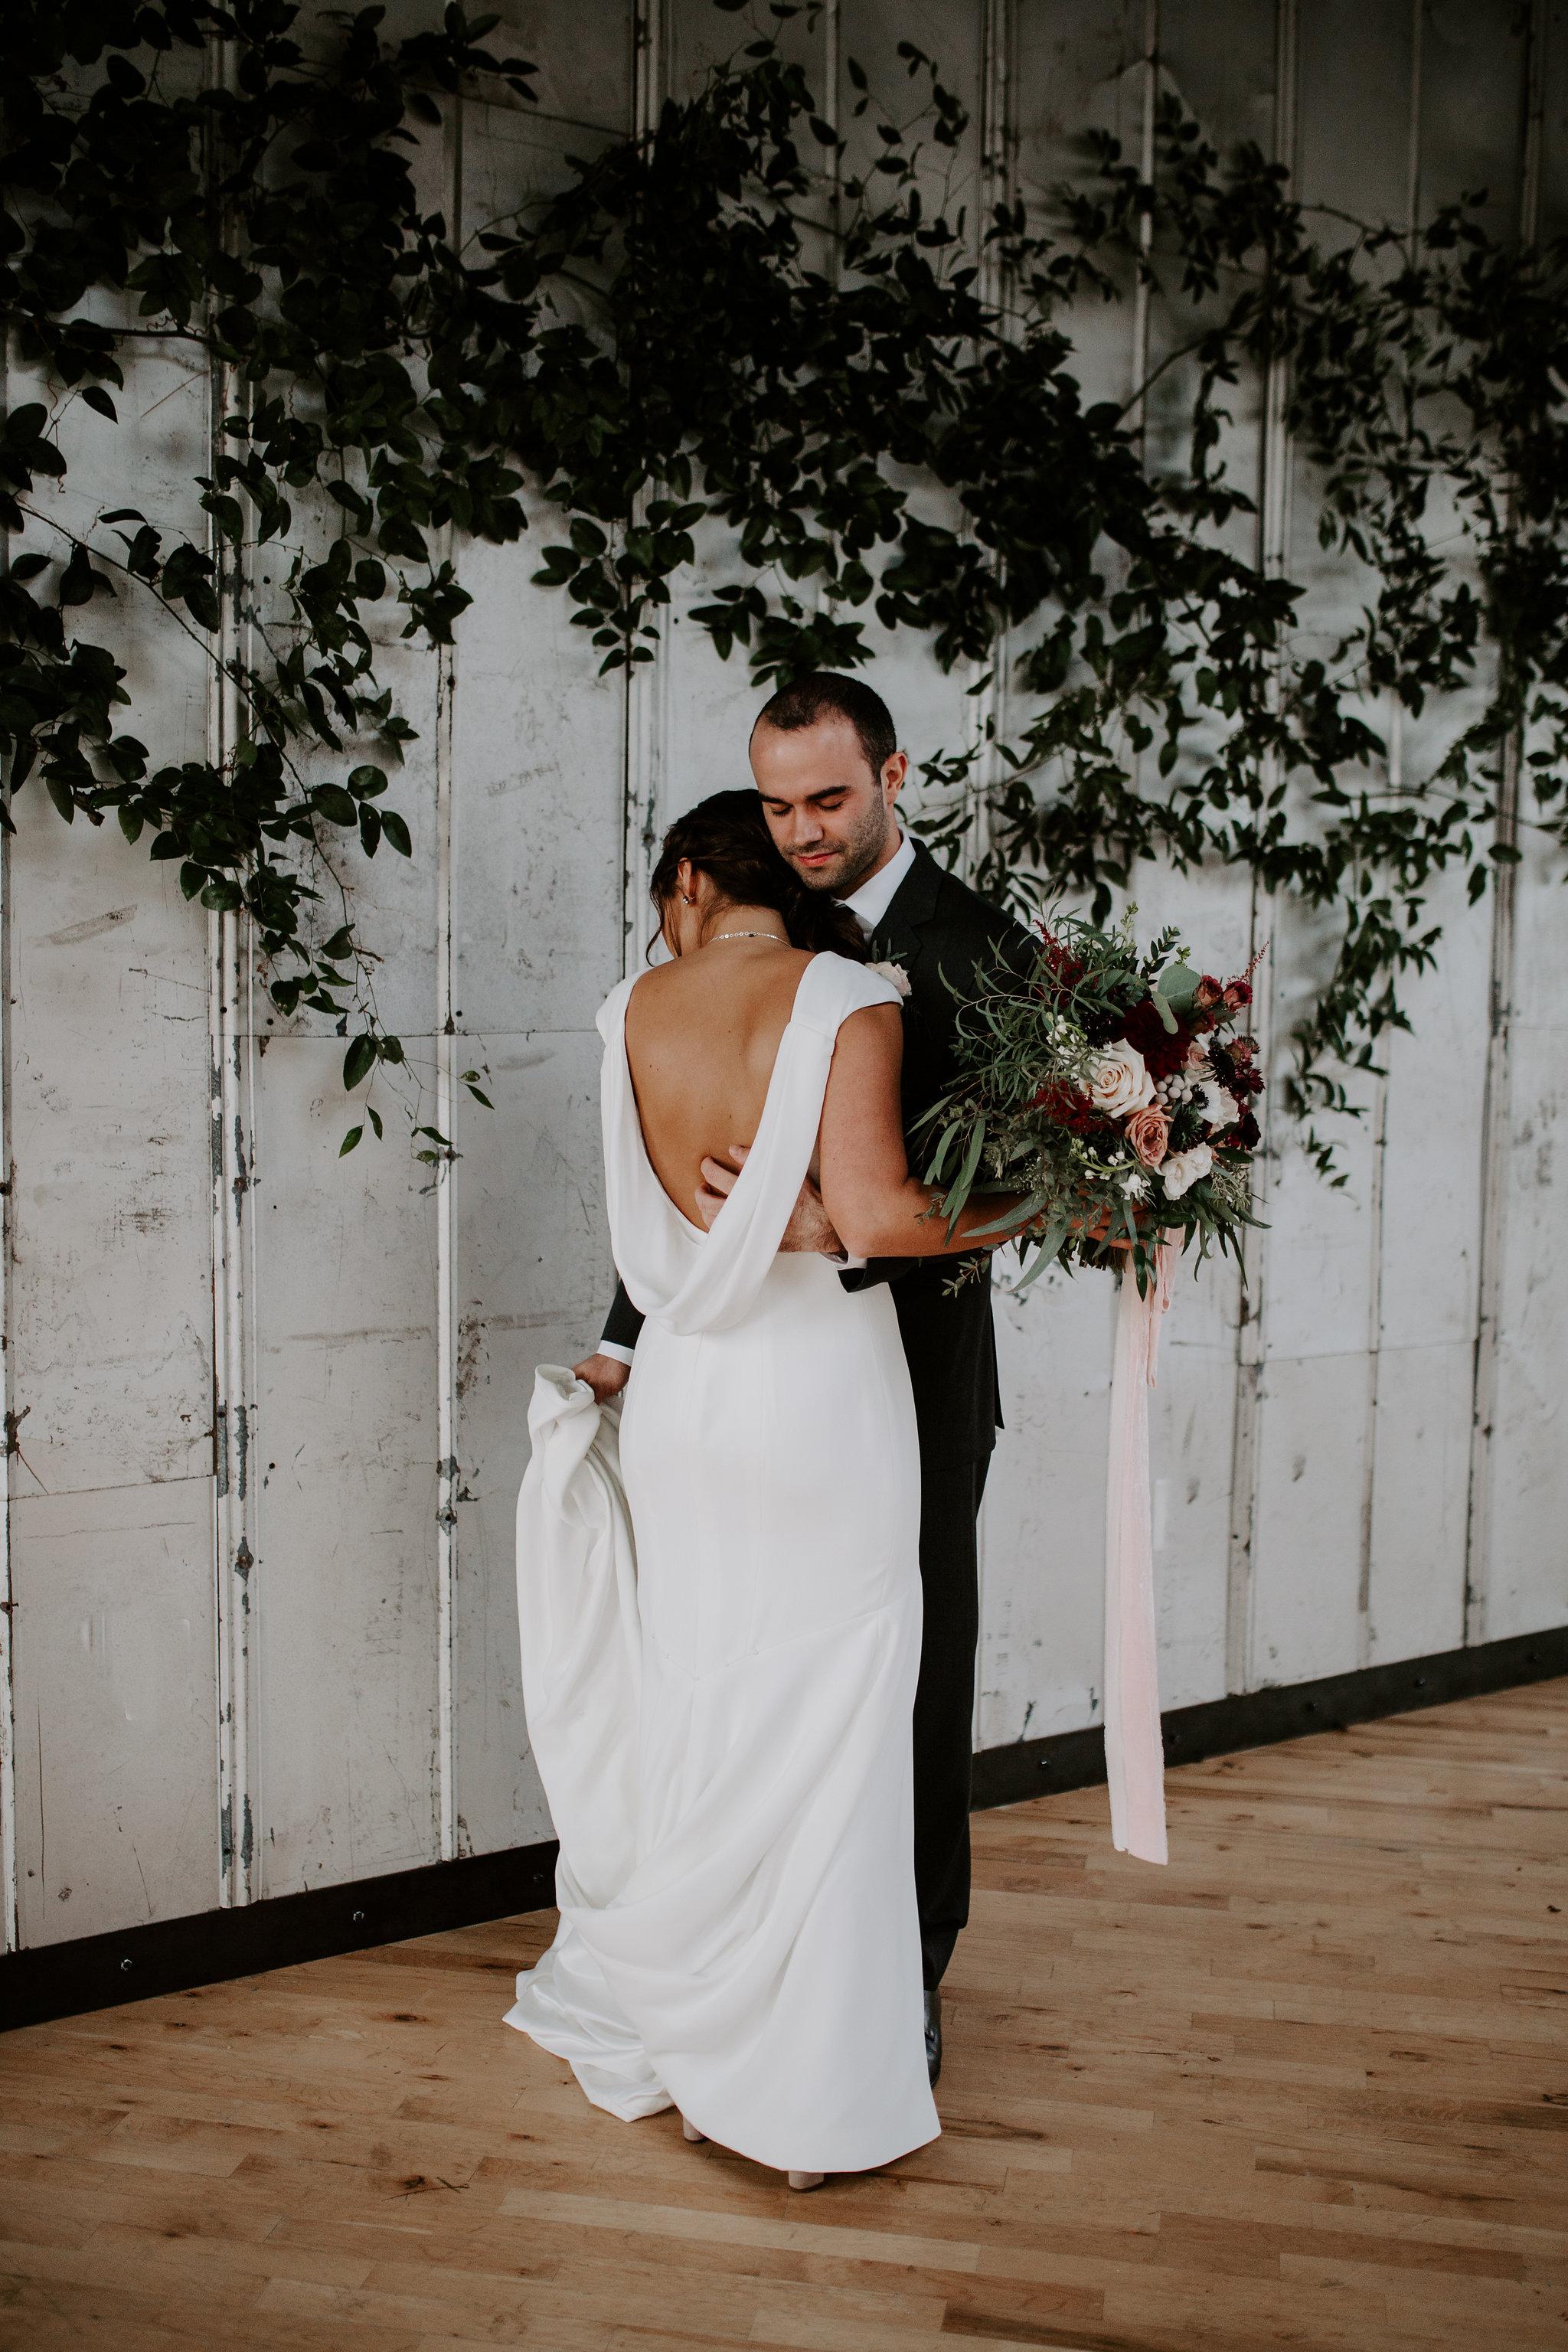 Minimalist Industrial Wedding A Griffin Events Mikayla Herrick DC534.jpg